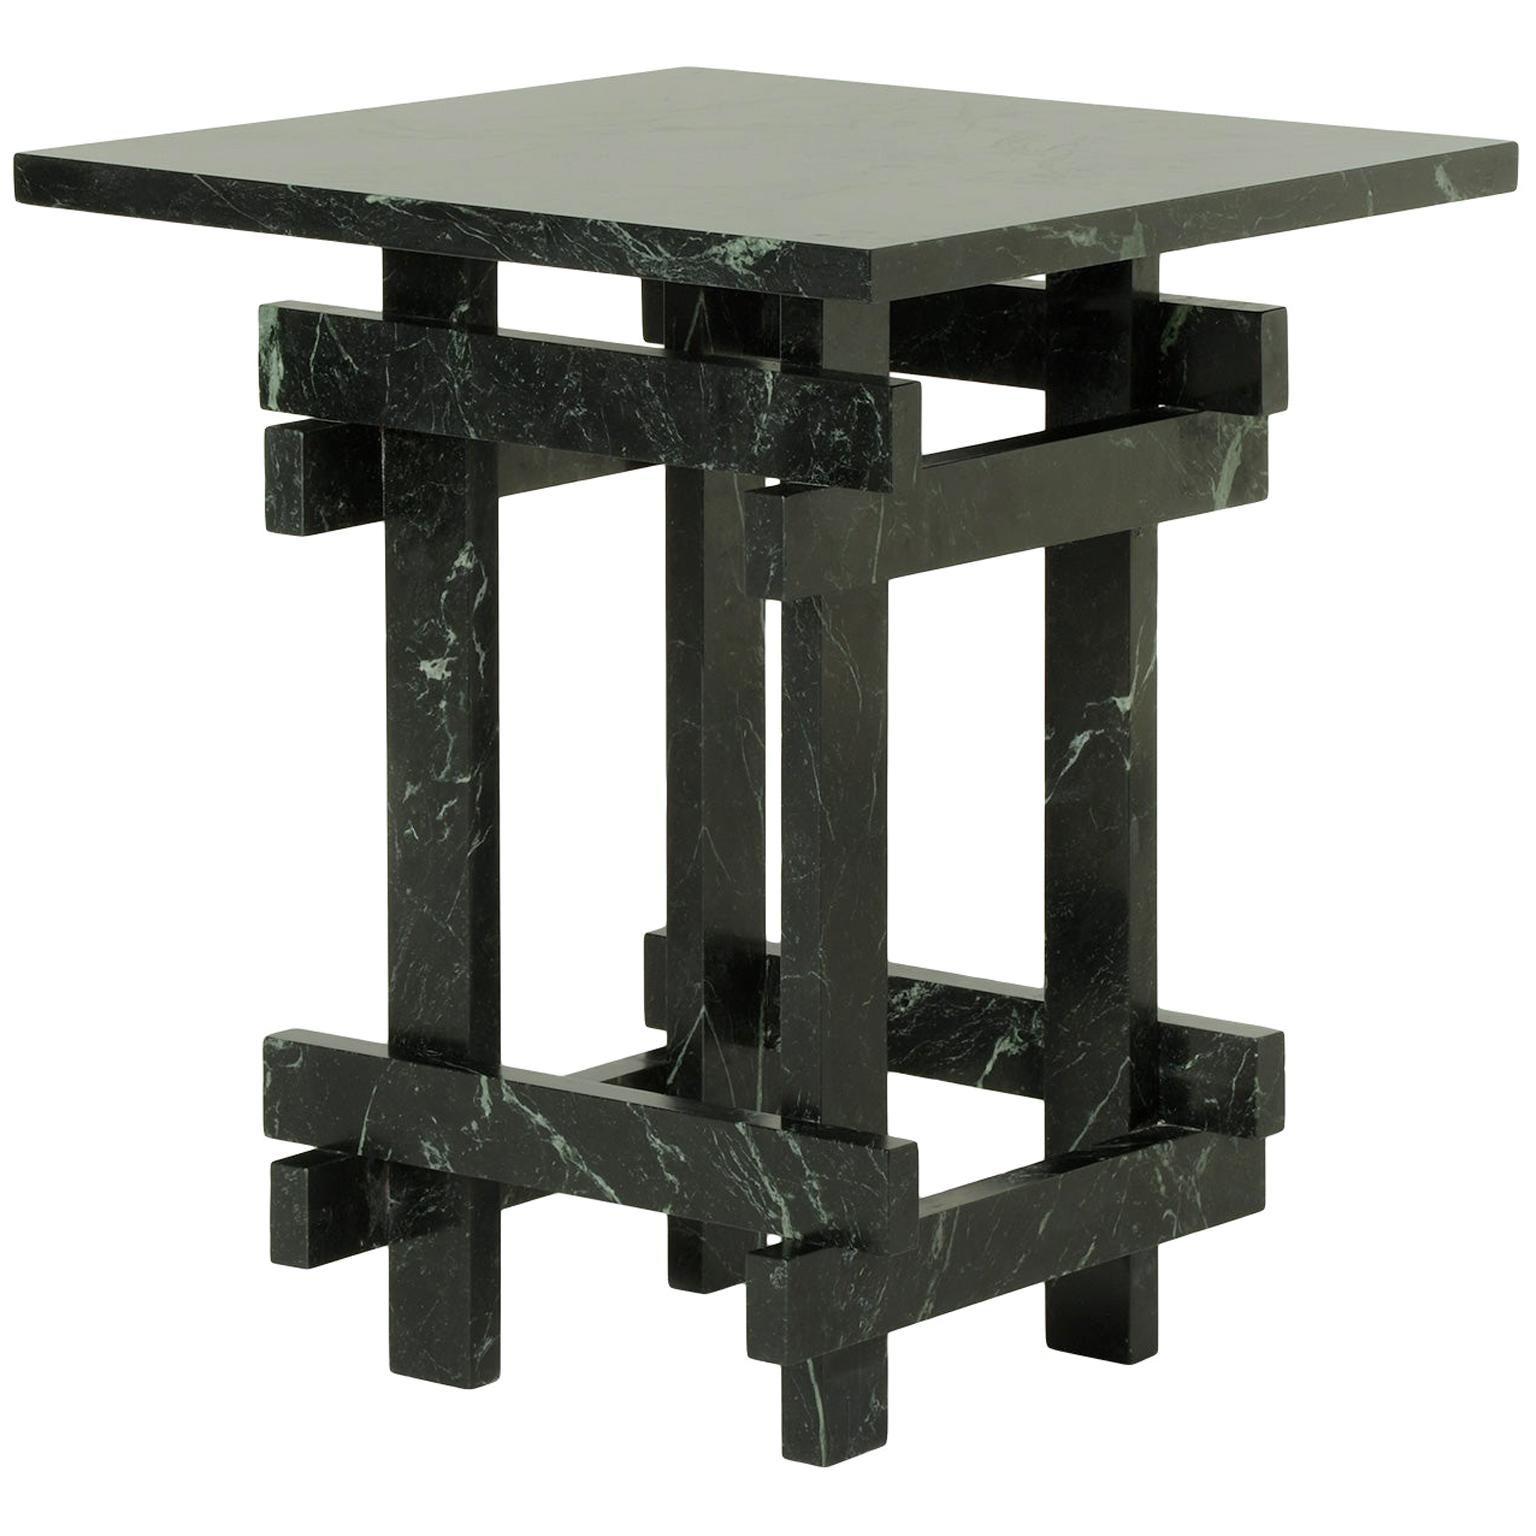 Paranoid N01, 21st Century Coffee Table in Dark Green Marble